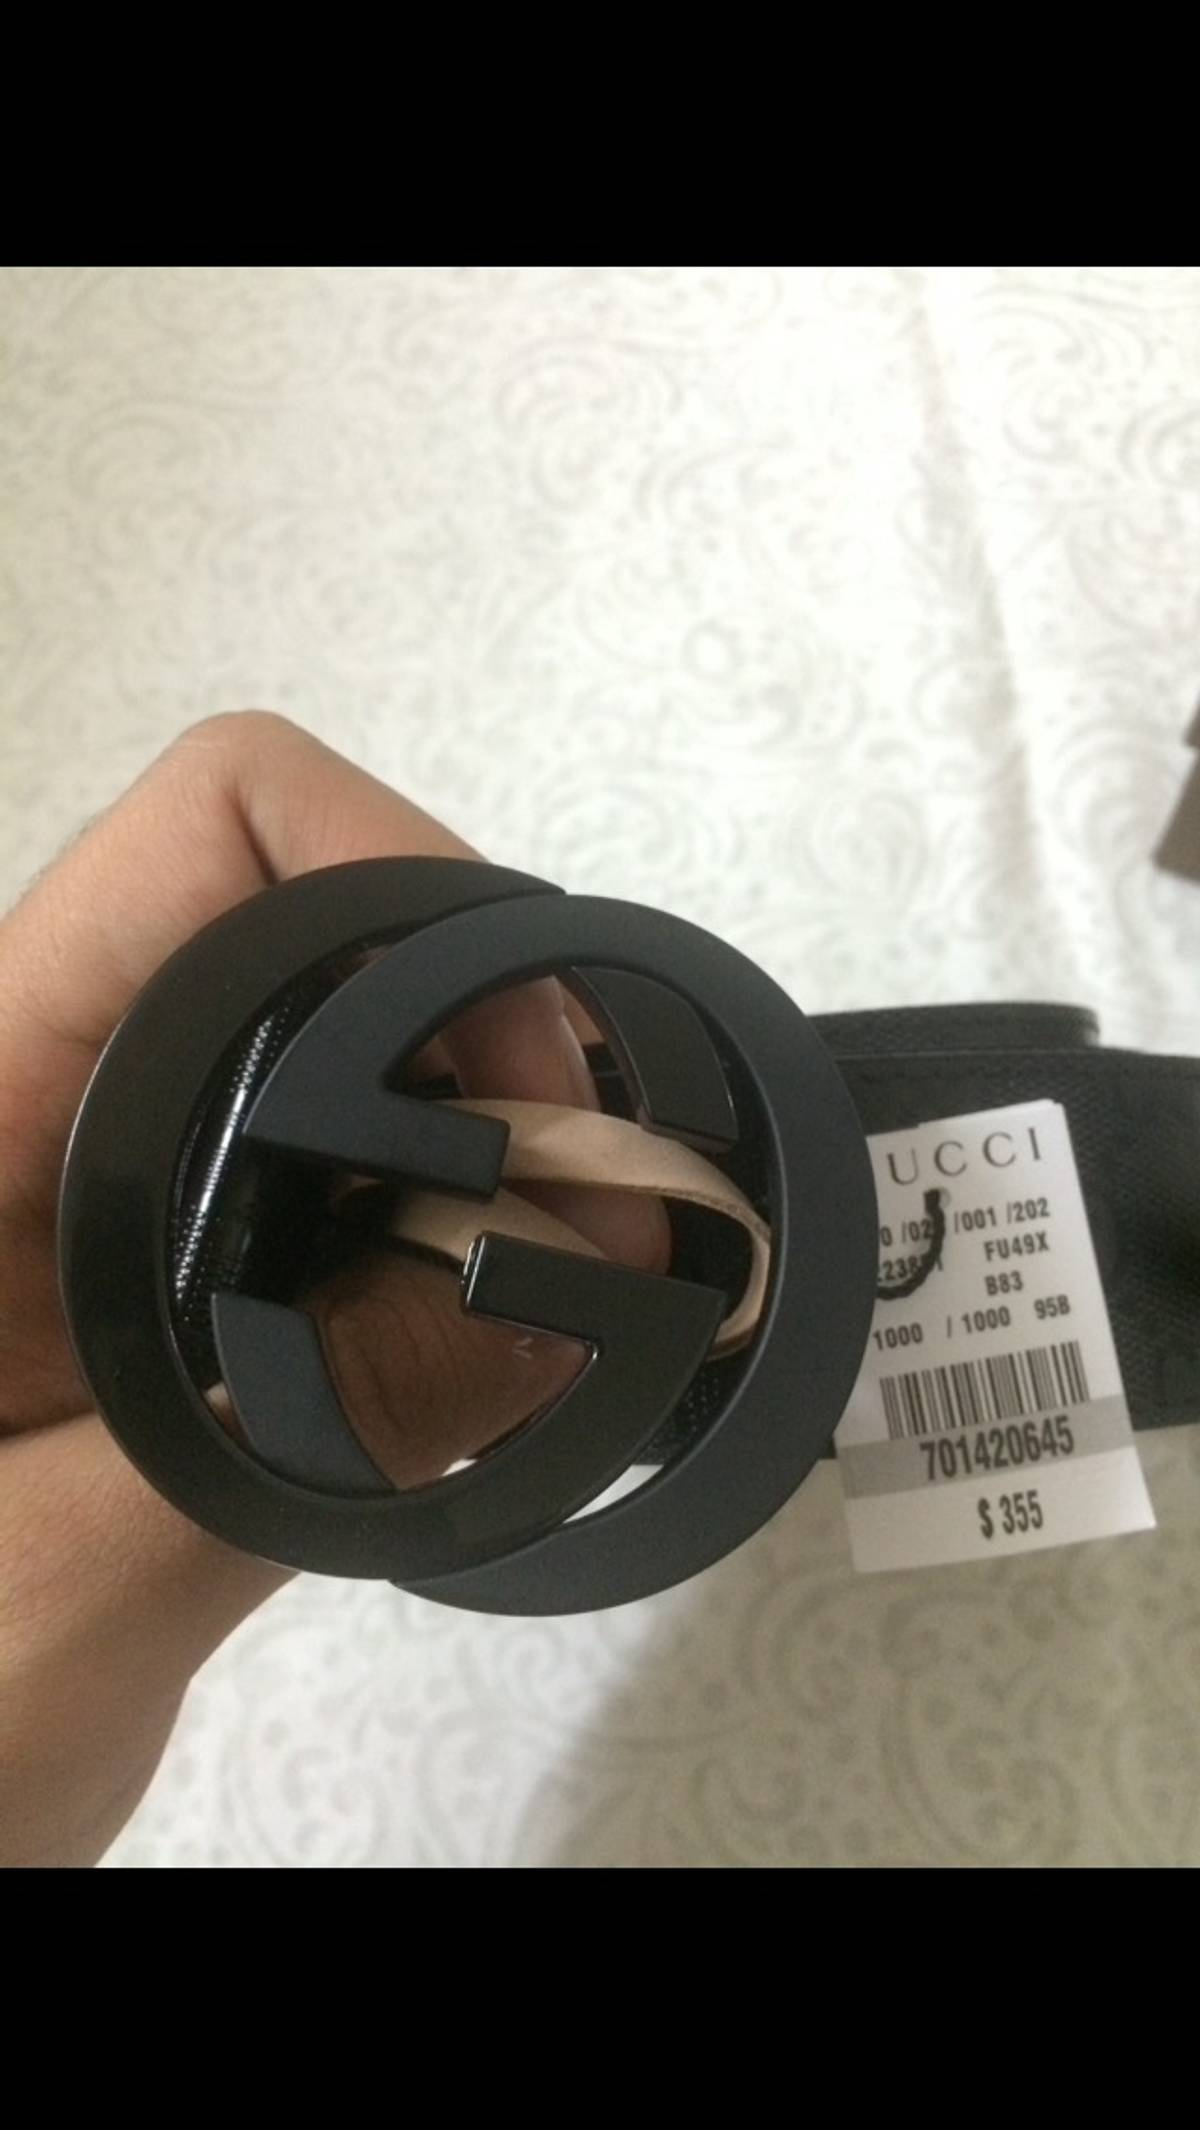 0f6e8eff07a Gucci NWT Authentic Gucci Men s Black GG Imprimé Shiny Belt Size 32 ...